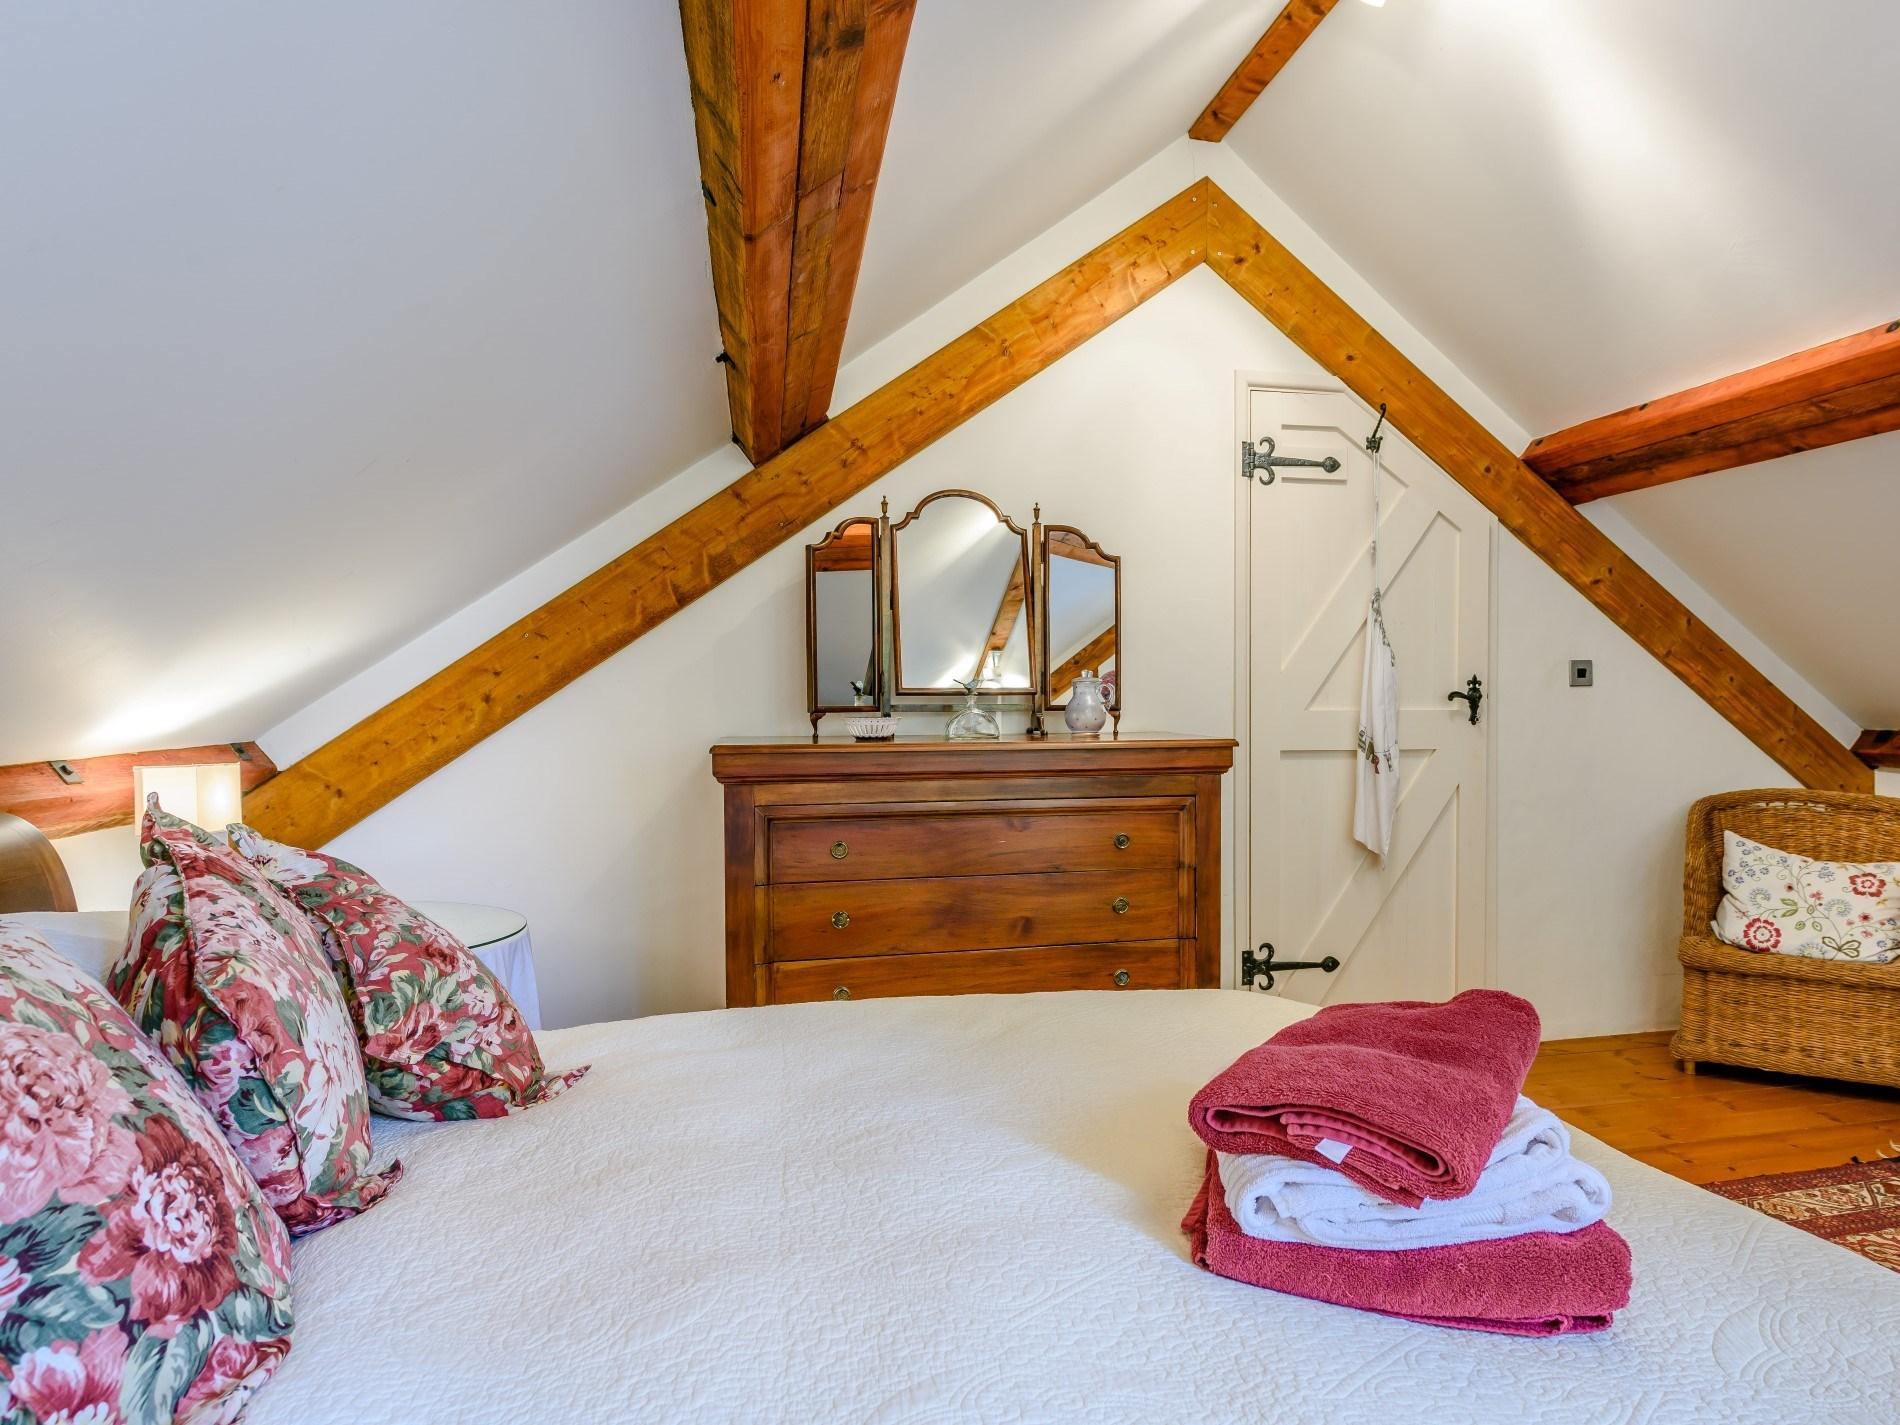 2 Bedroom Cottage in Crediton, Devon